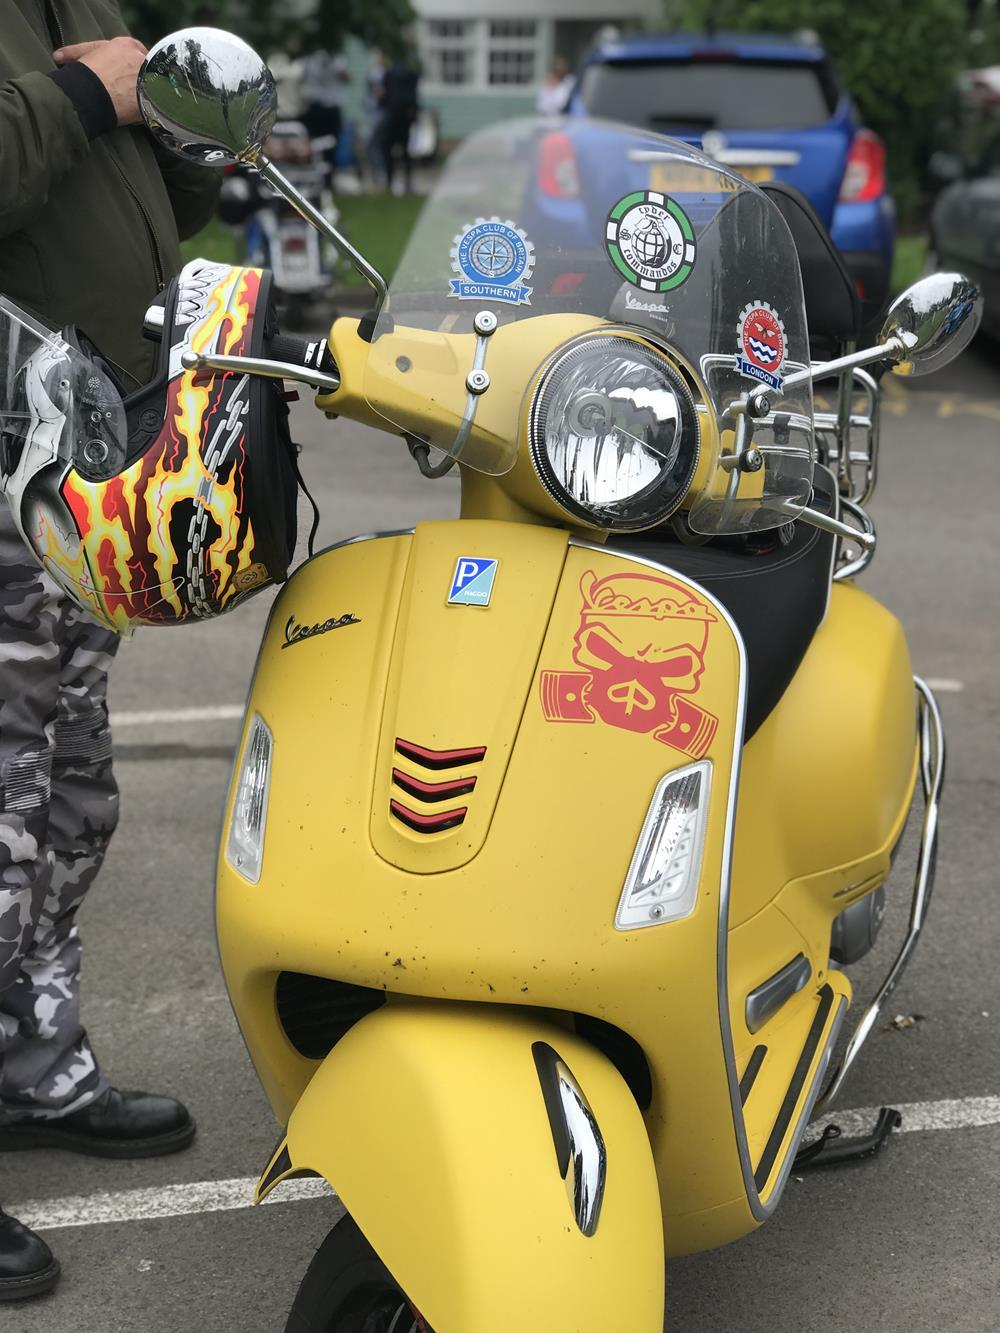 Yellow Vespa GTS scooter